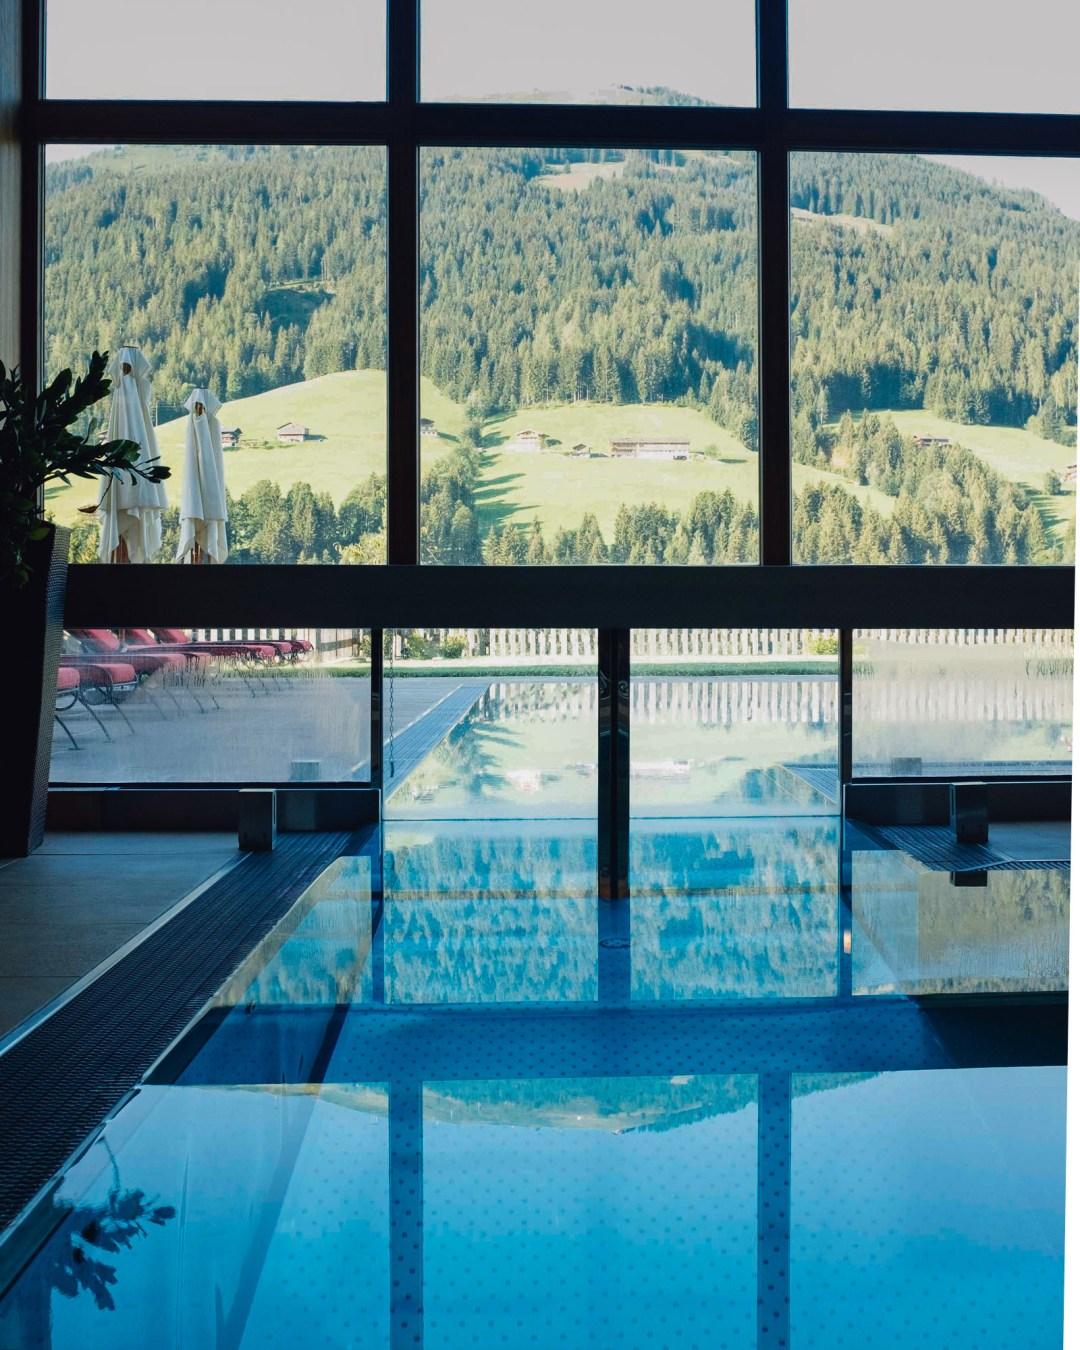 inastil, over50blogger, Alpbach, Alpbacherhof, Tirol, Austria, Visittirol, Wandern, Mountainbike, travelblogger, traveldiary, Urlaub, Urlaubinösterreich-34